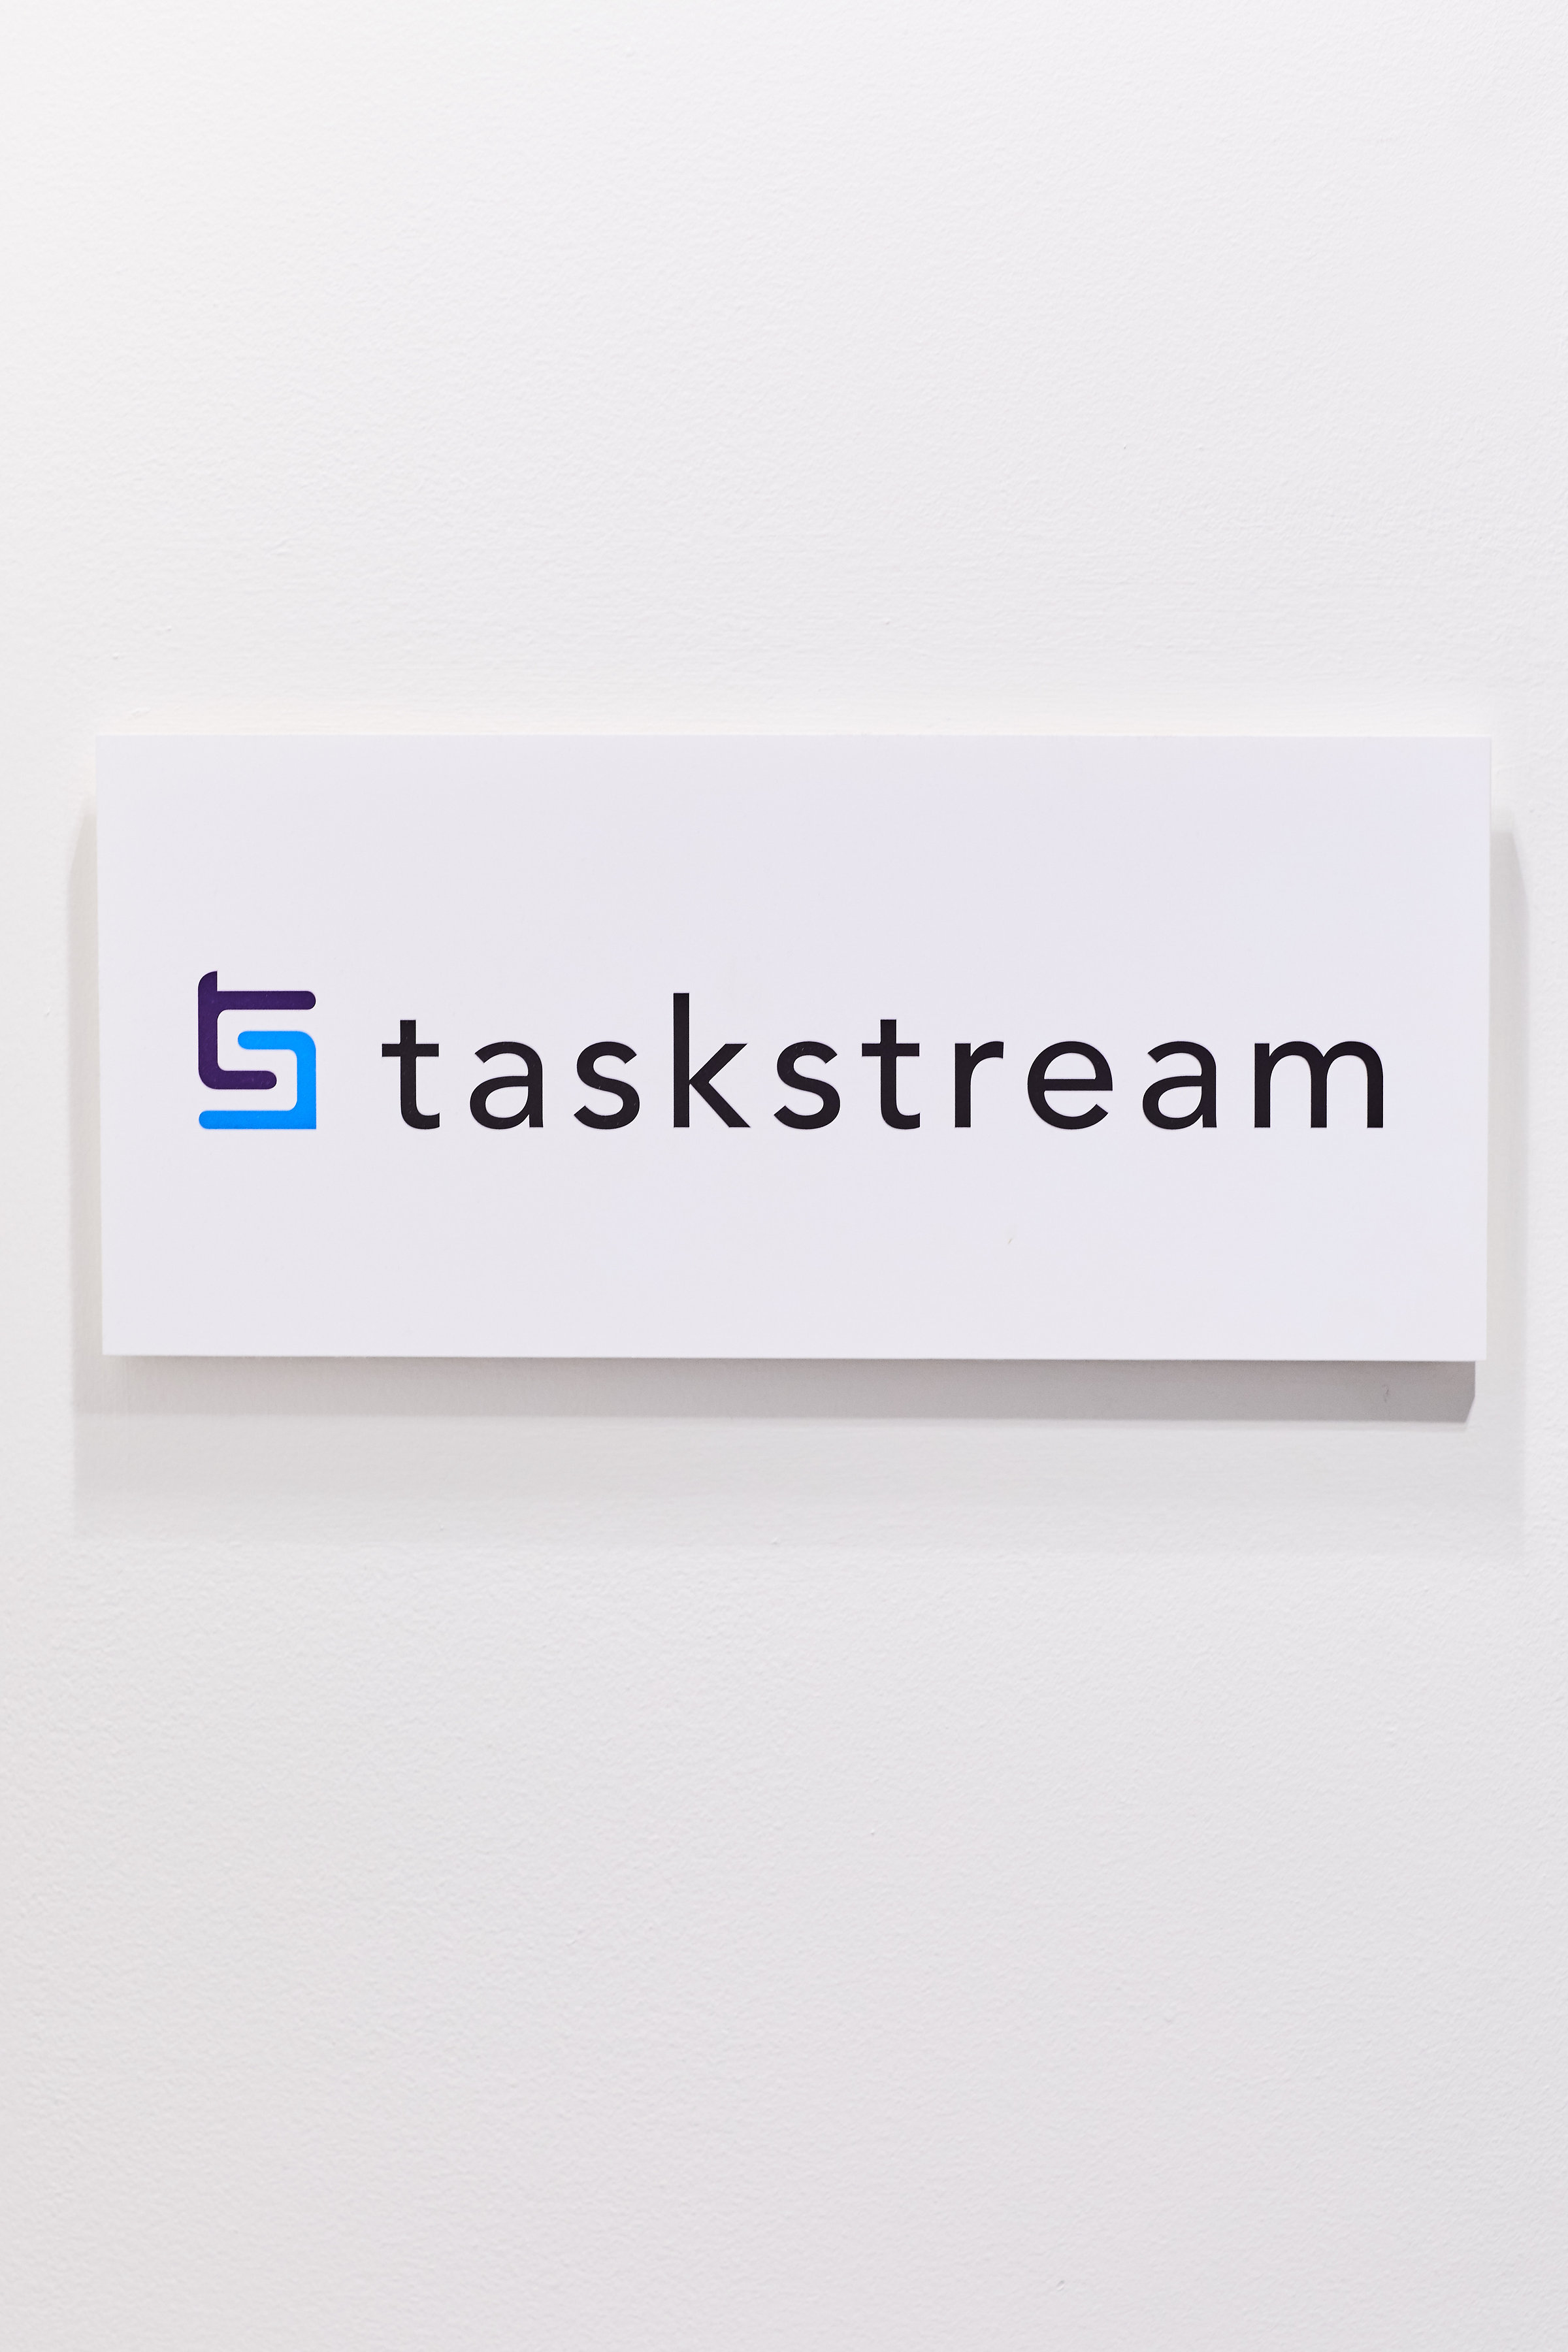 Taskstream-Jan4-Candids-2914.jpg